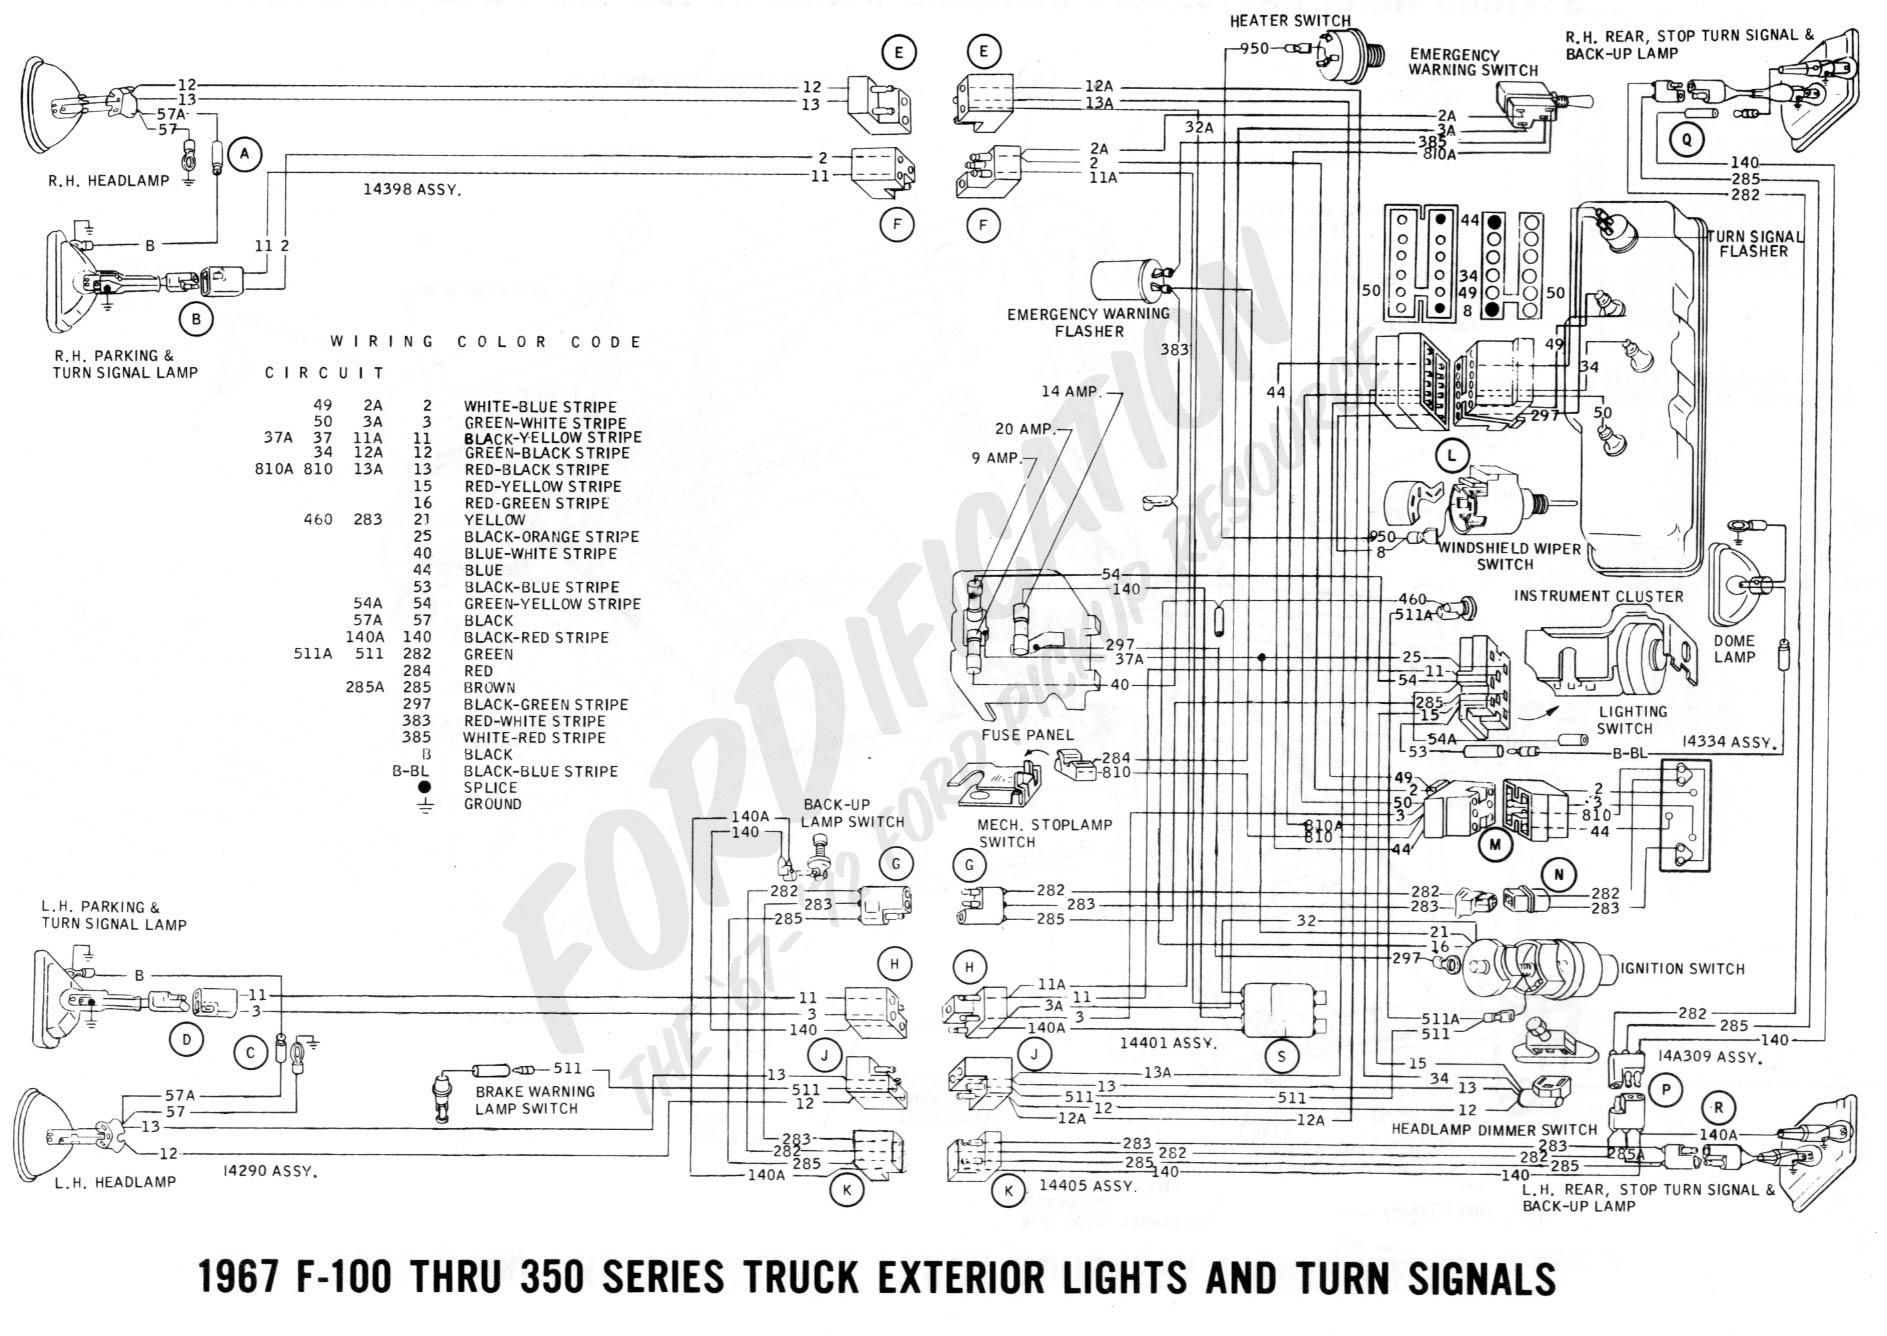 wiring 1967extlights02?resize\=665%2C471 ford 02 sel wiring diagram,sel free download printable wiring diagrams,Ford 6 9 Sel Wiring Diagram